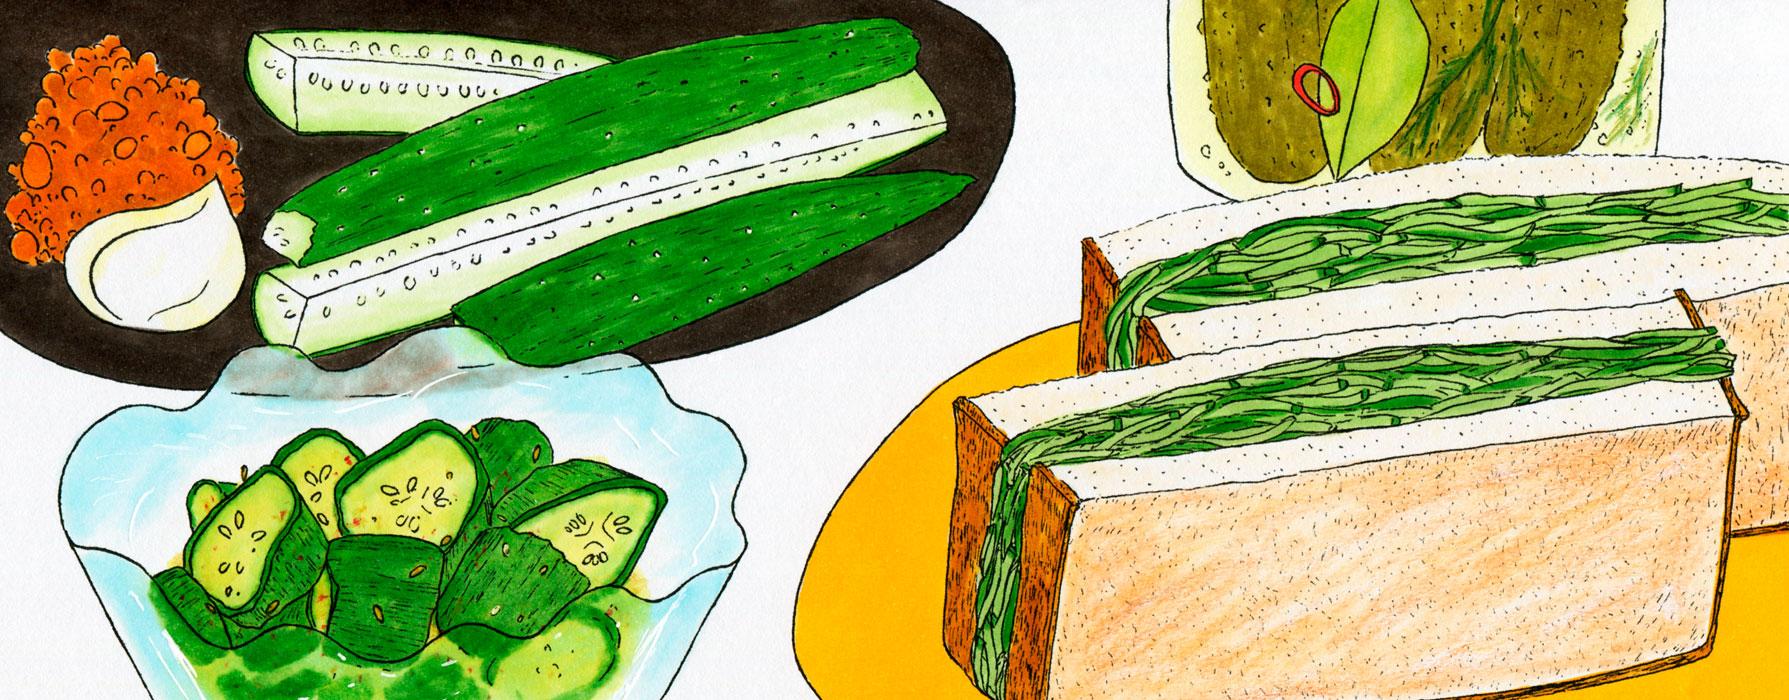 「栄養と料理」(女子栄養大学出版部)「機能性成分のひみつ」2018年7月号〜現在連載中